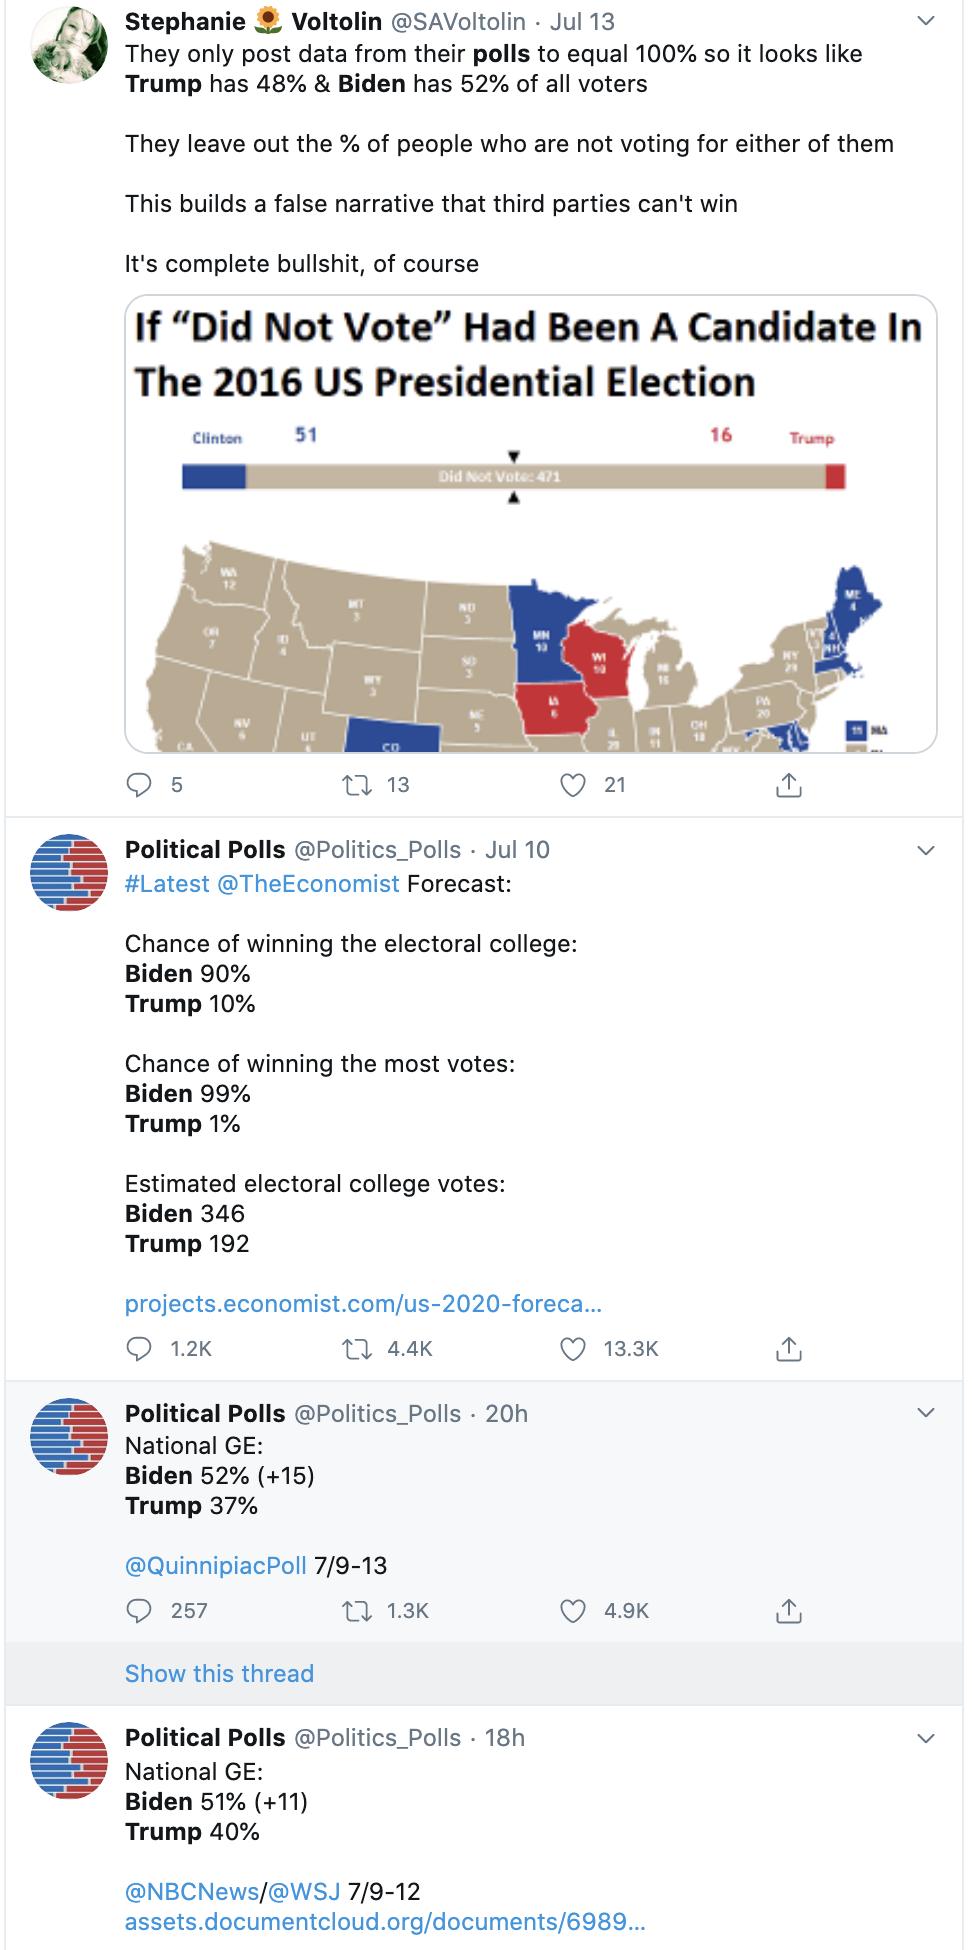 Screen-Shot-2020-07-16-at-10.46.49-AM Biden Rockets Past Trump By 15 Points In Latest National Poll Coronavirus Featured Politics Polls Top Stories